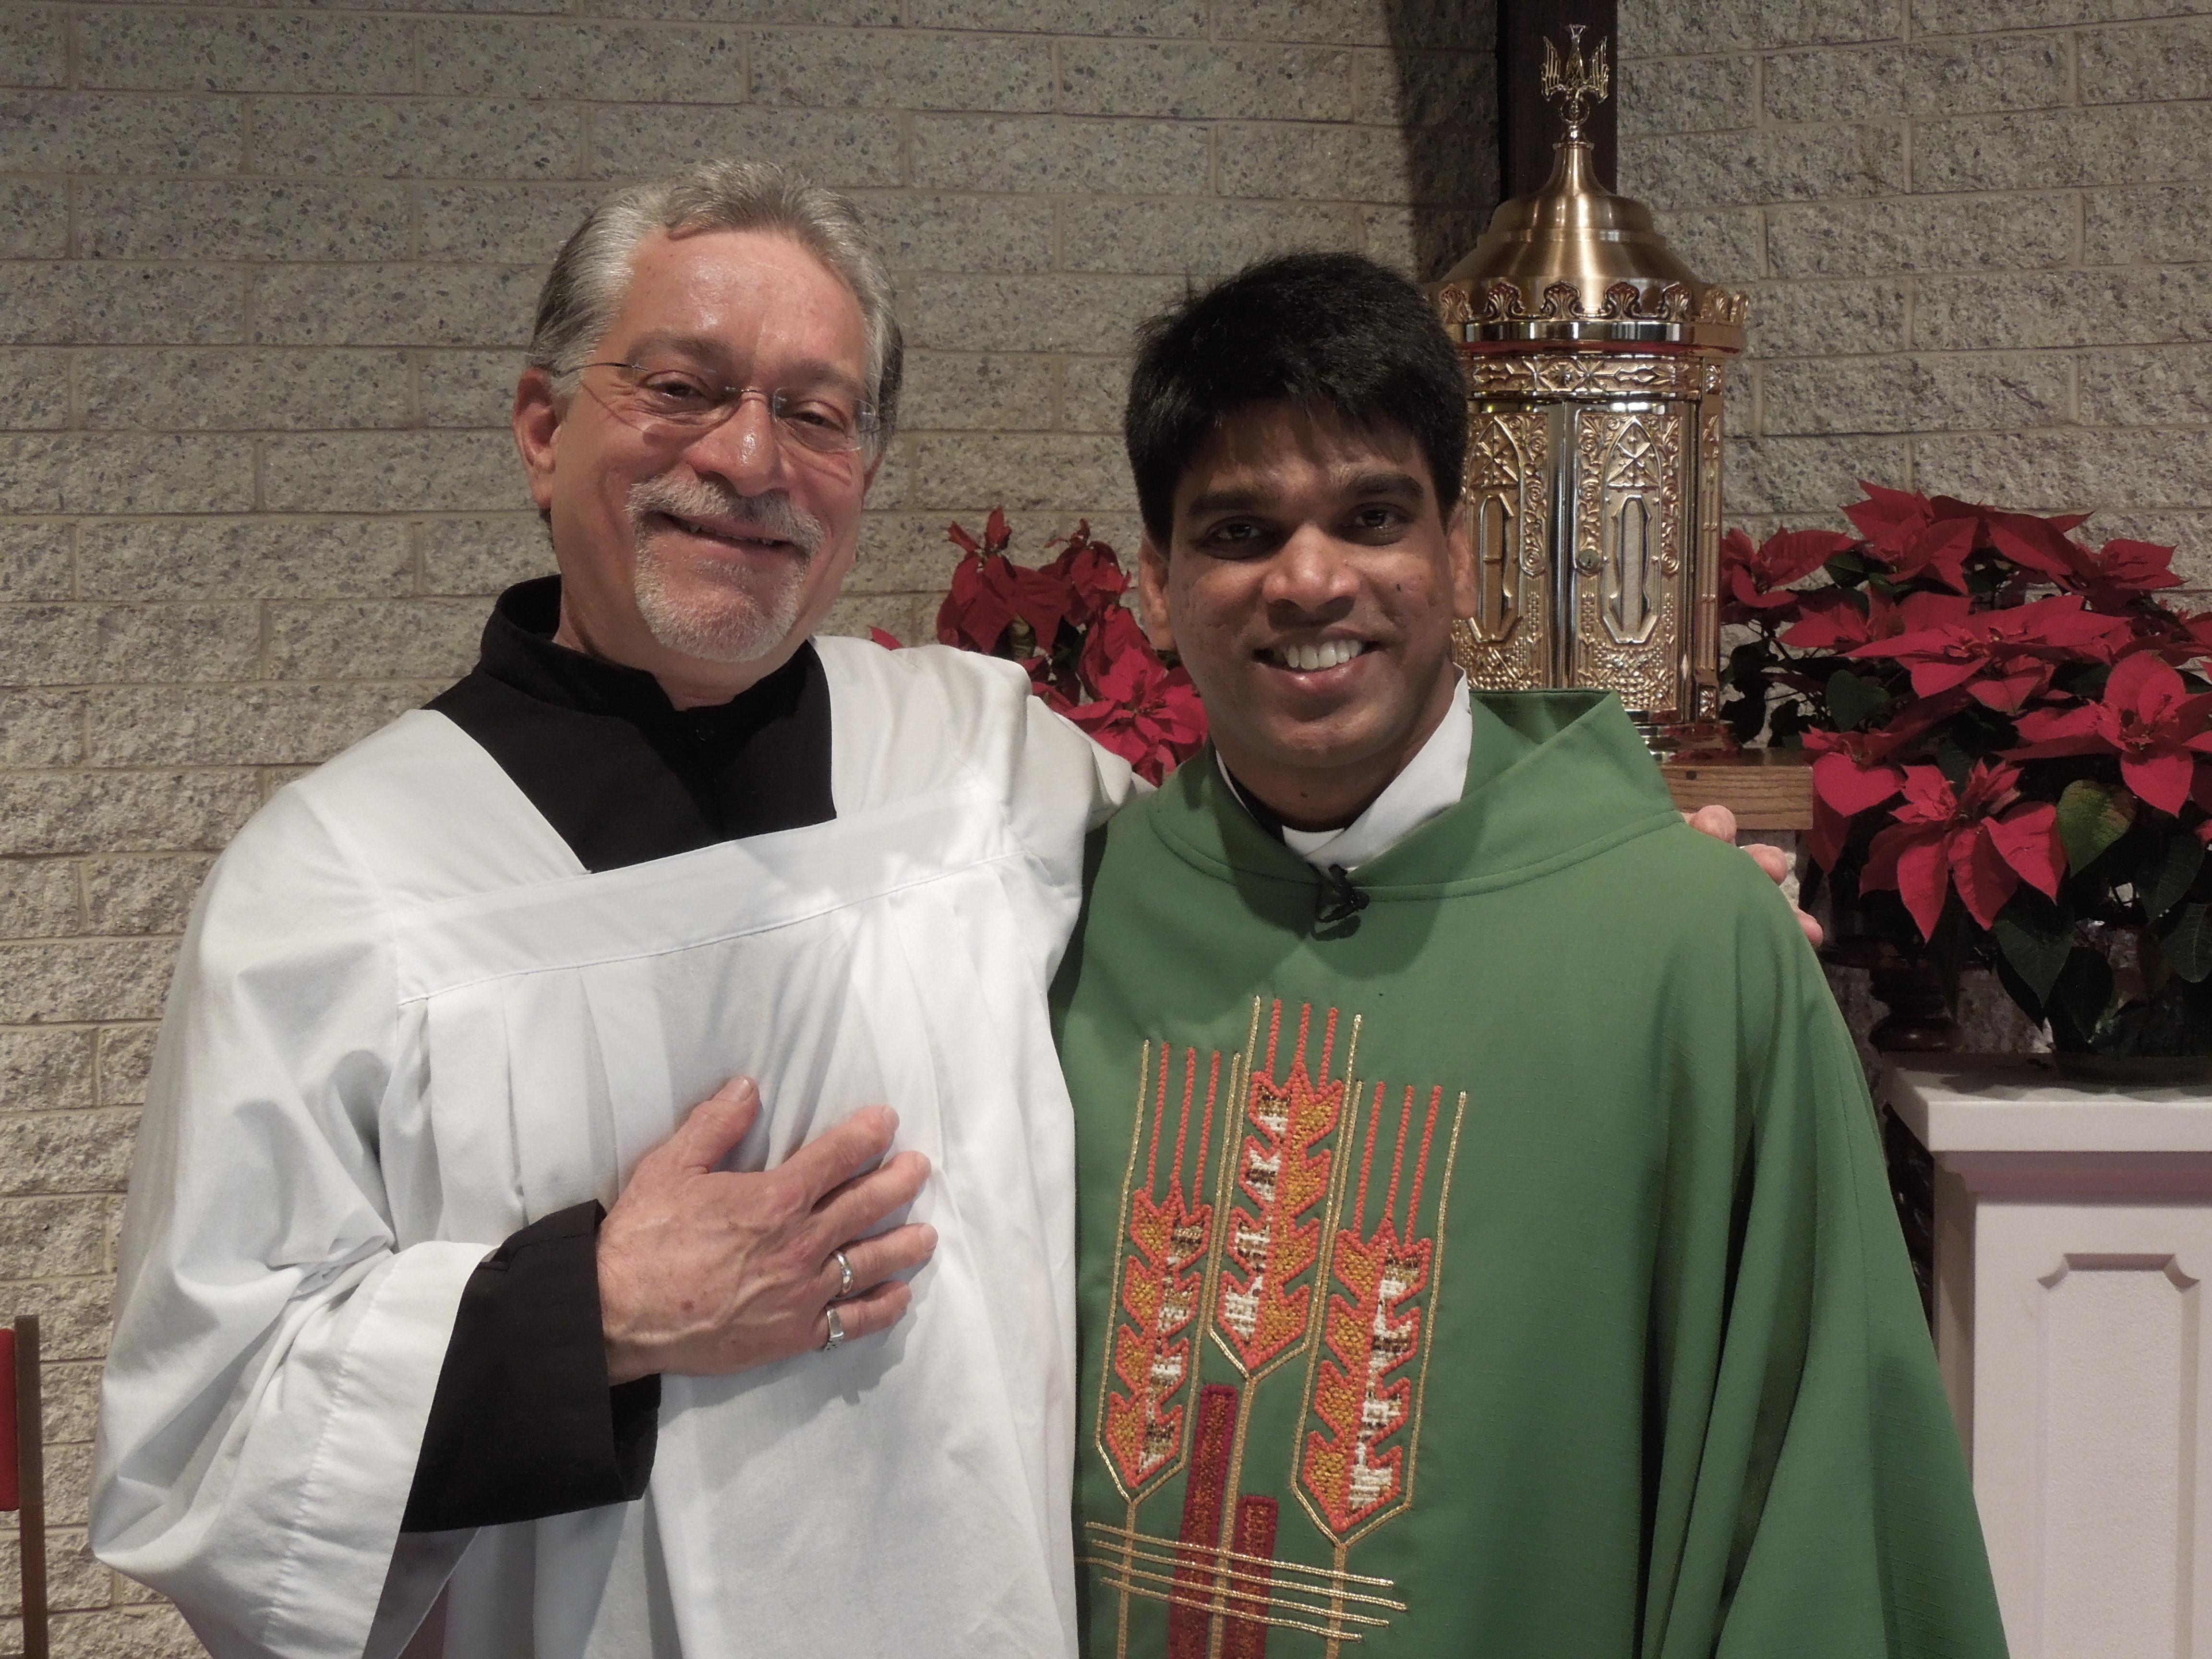 Randy and Fr Joseph